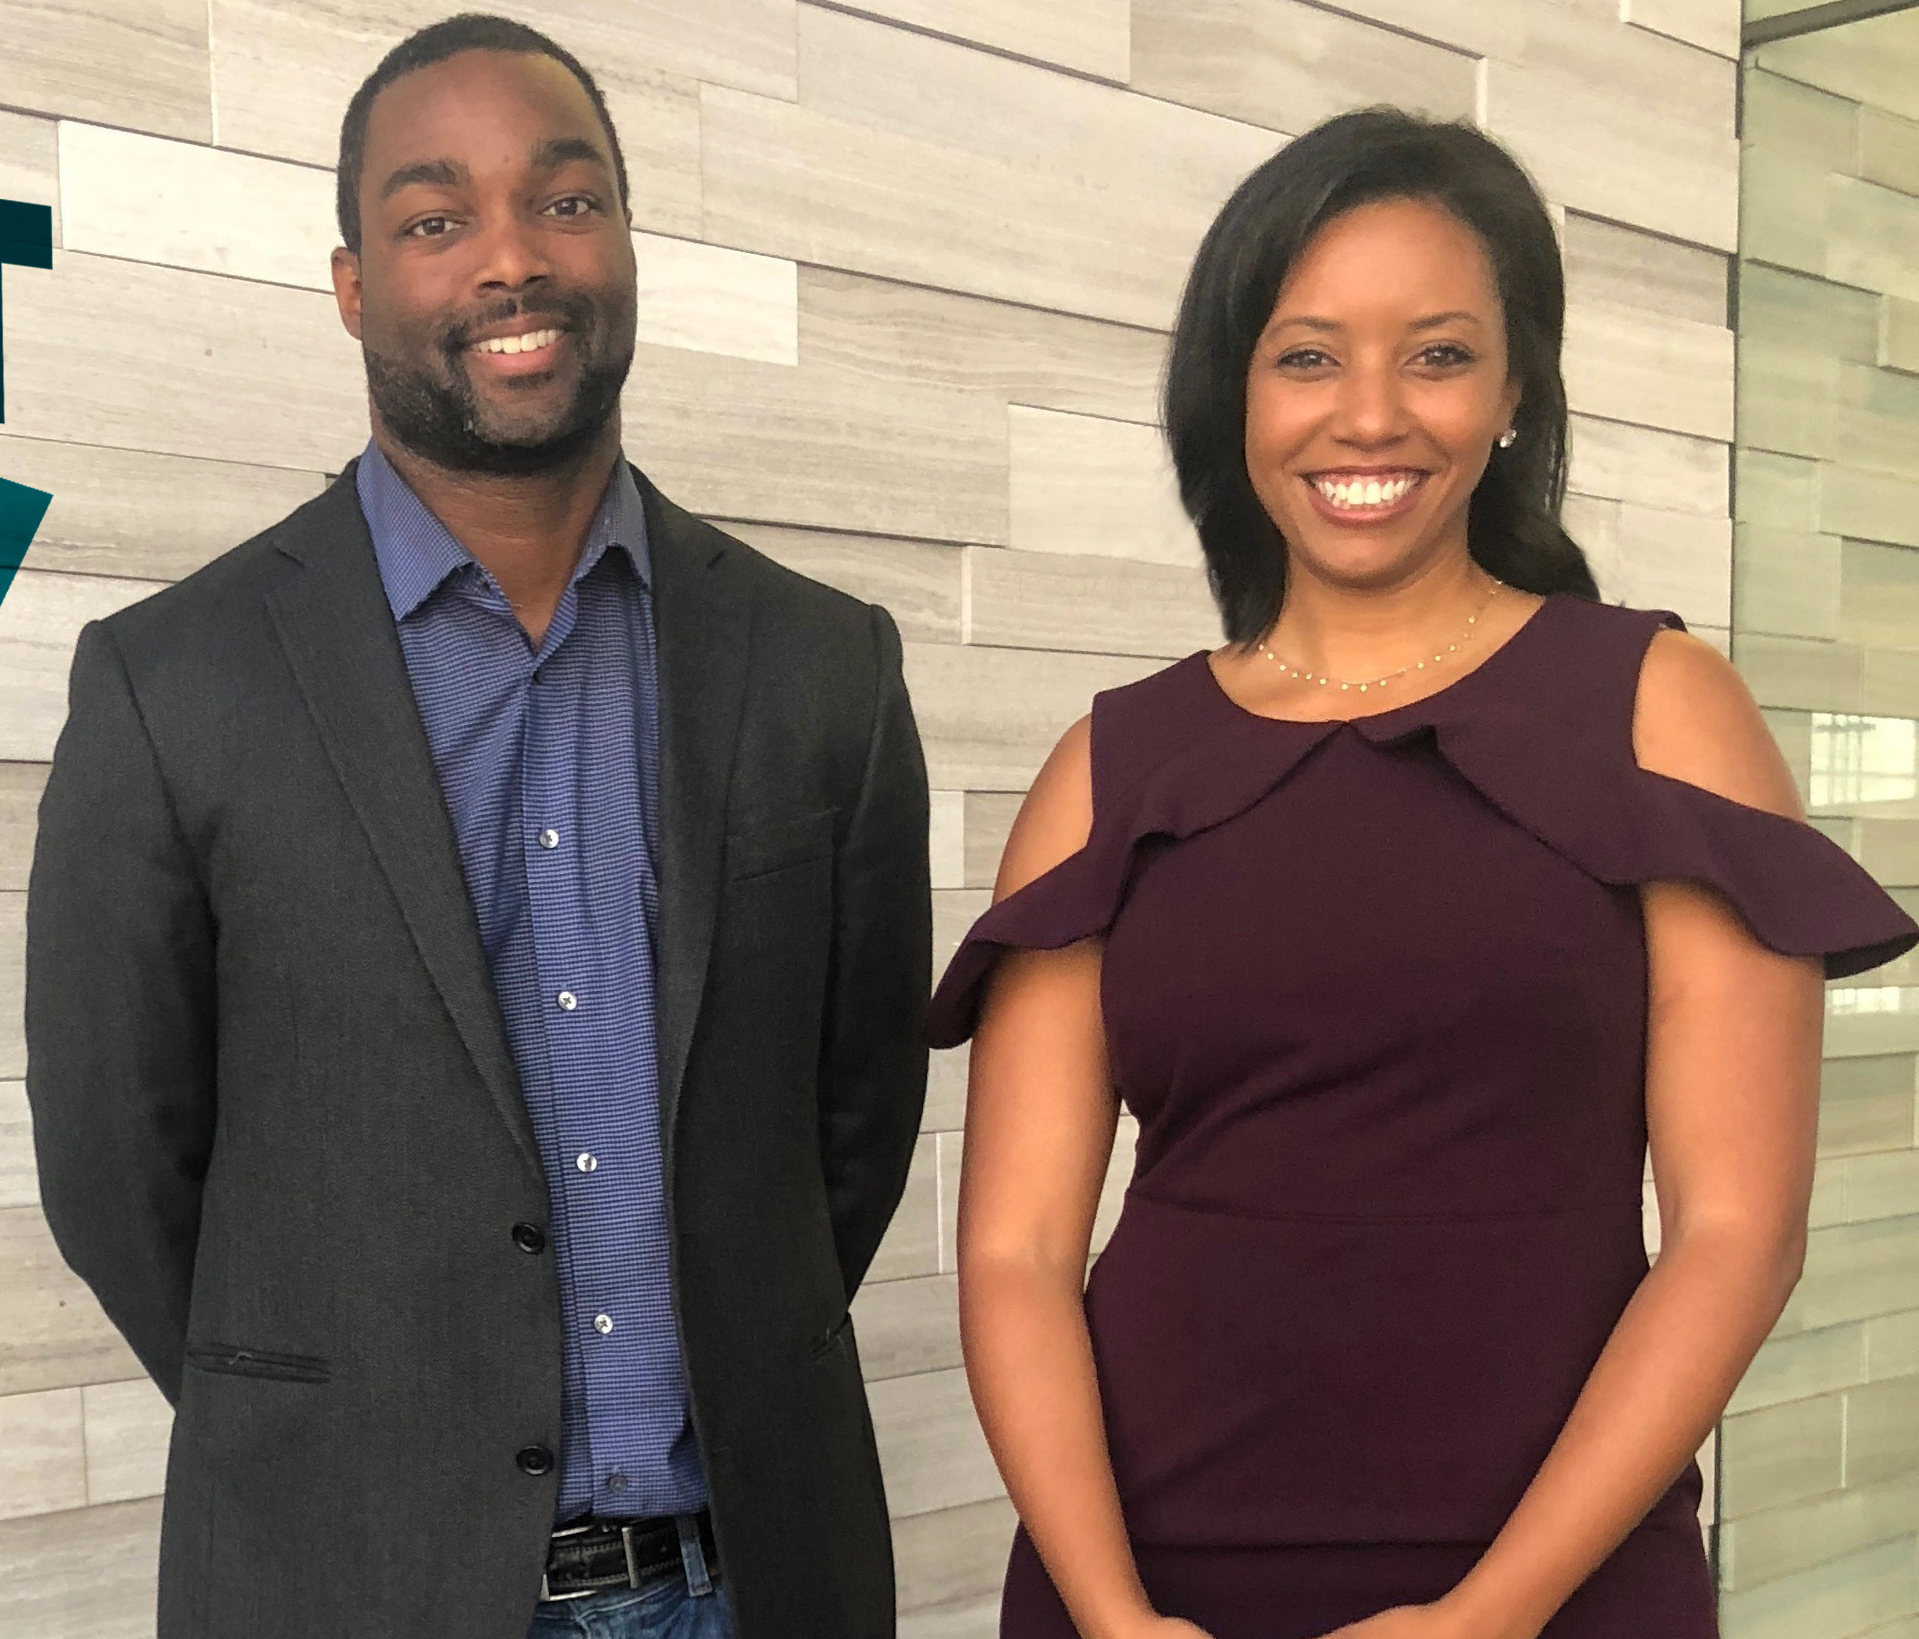 Court Buddy Founders, James and Kristina Jones